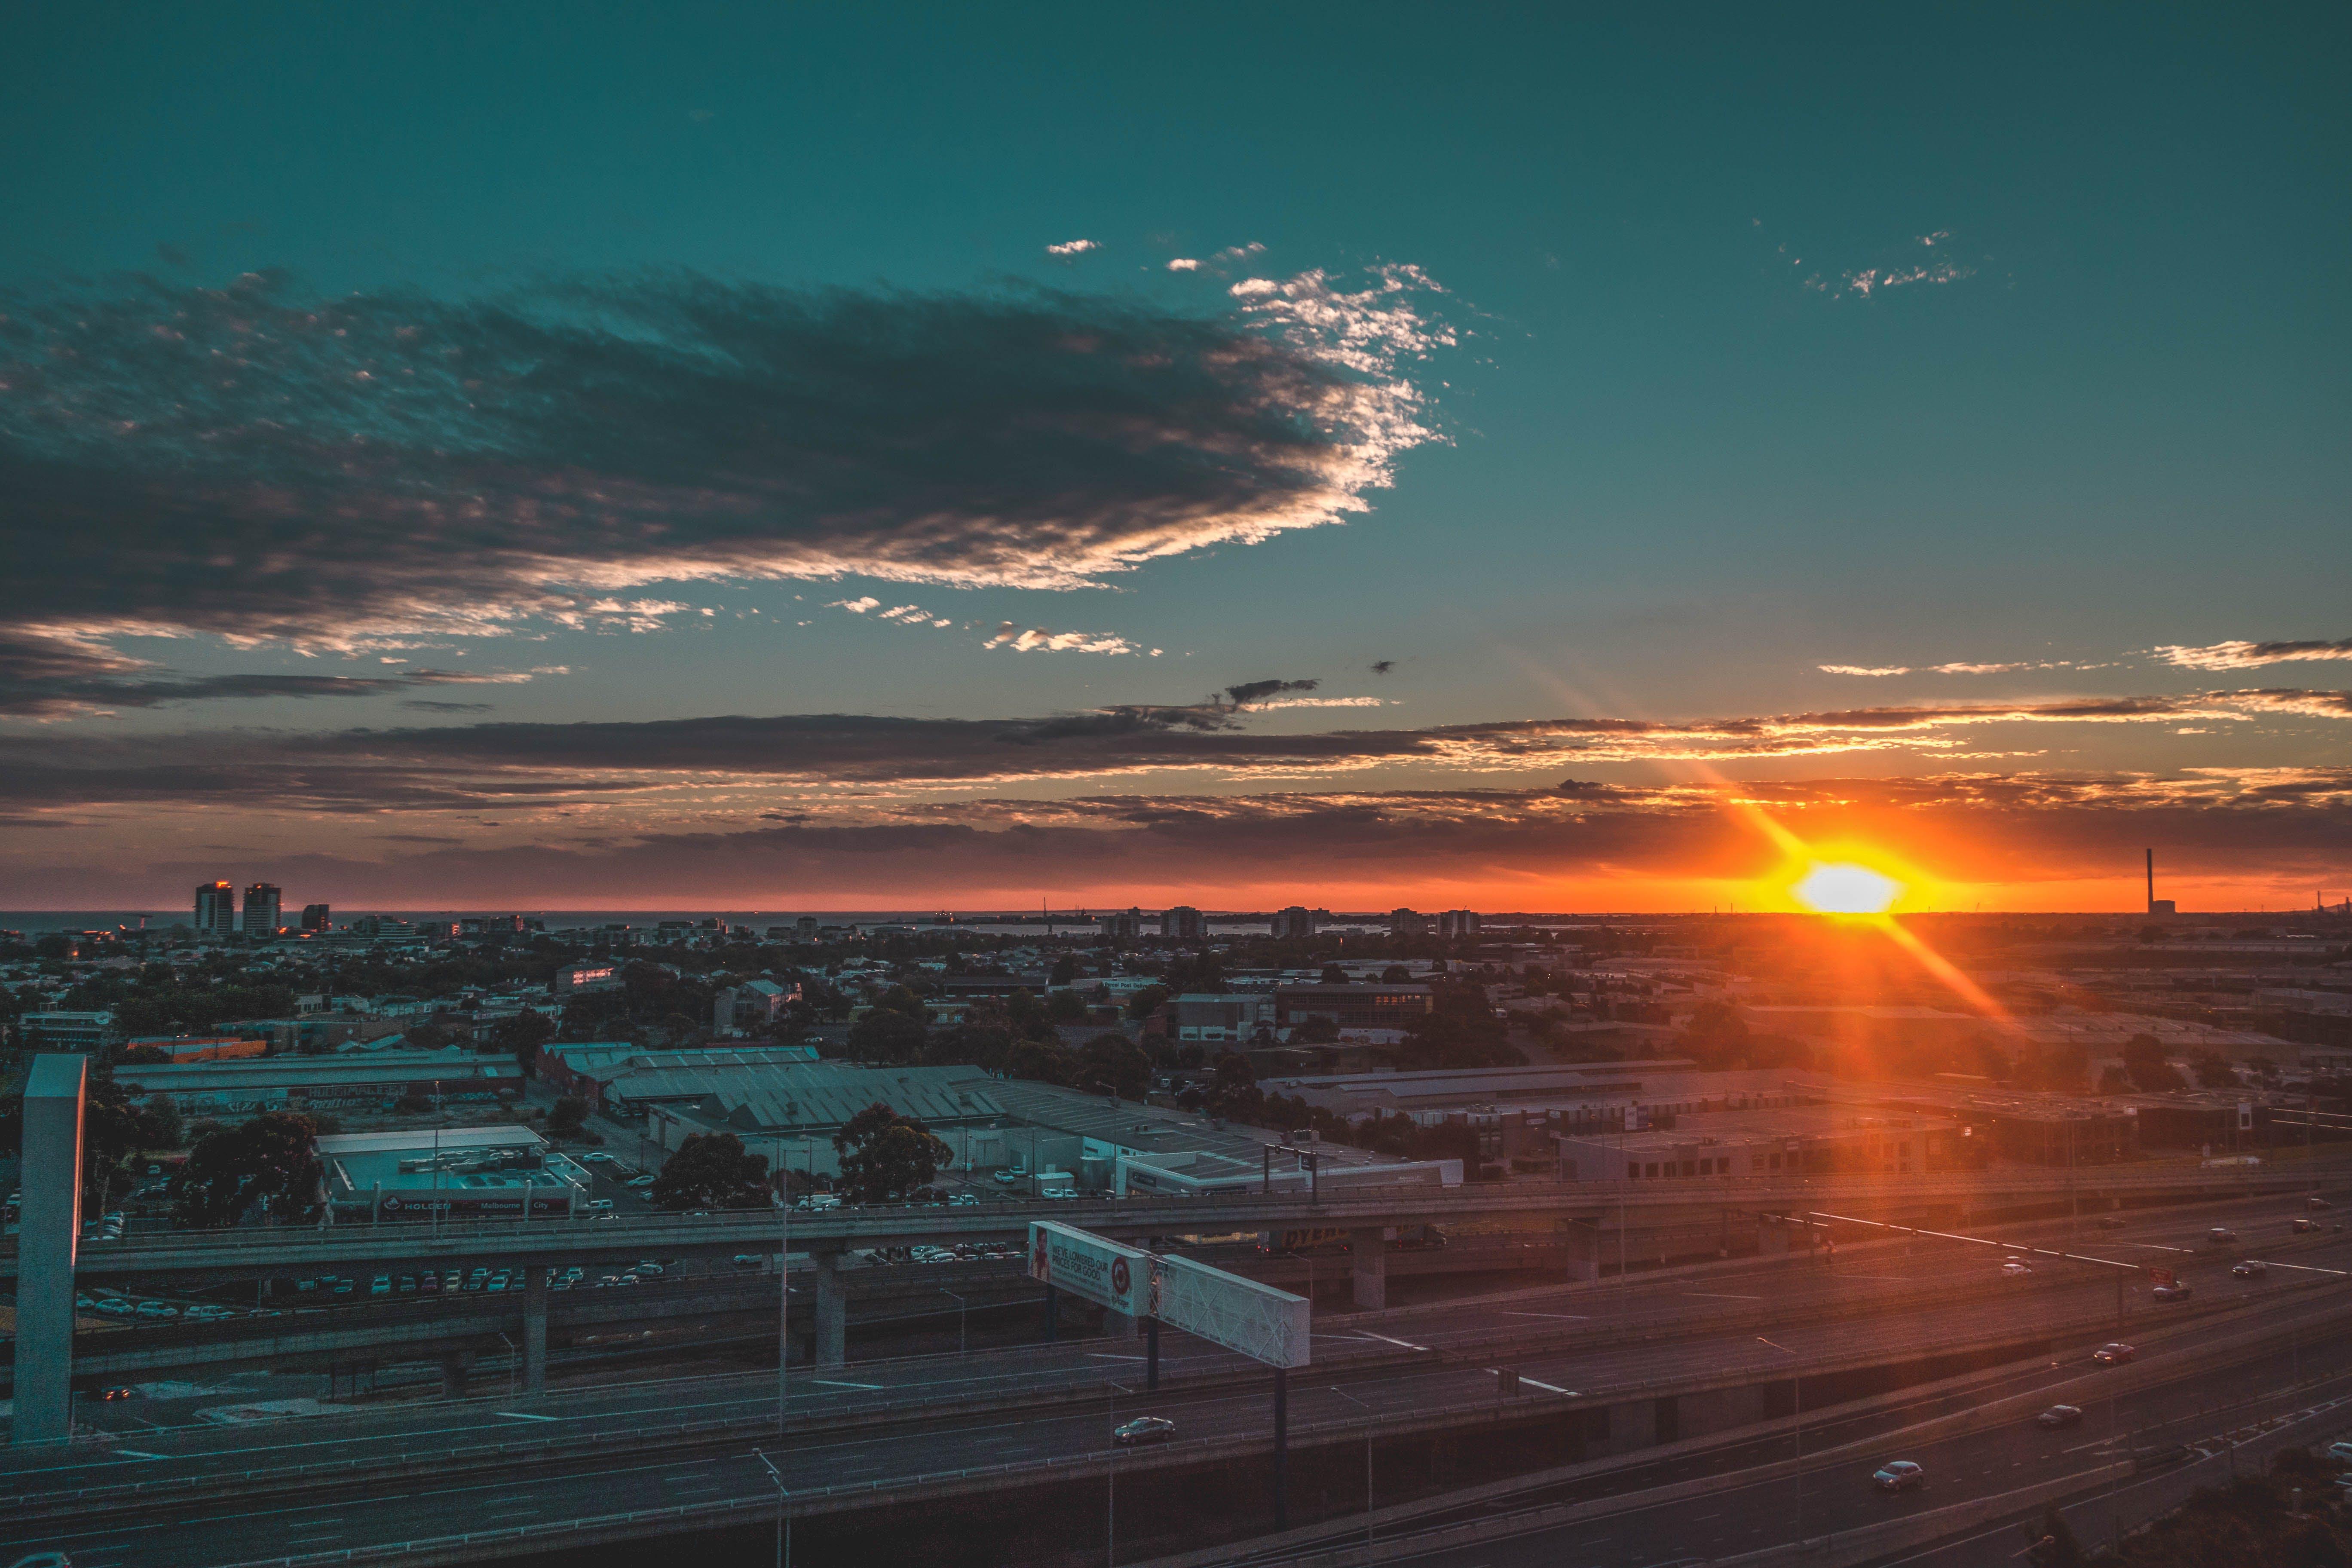 Aerial View of Sunset on Horizon